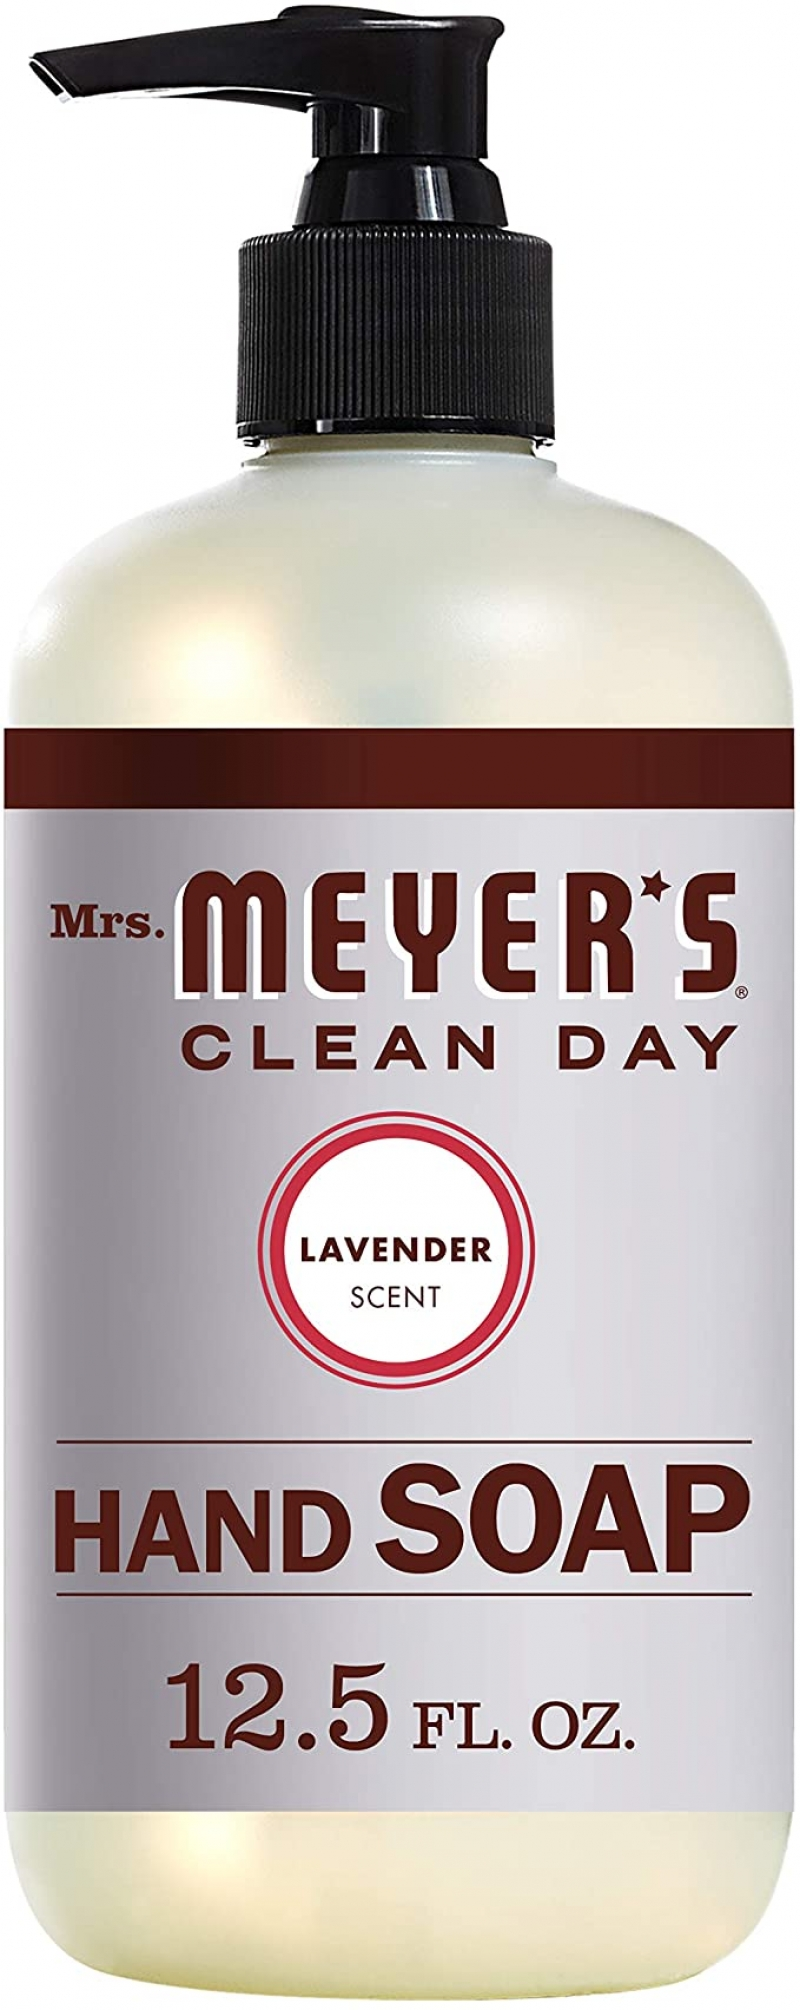 ihocon: Mrs. Meyer's Clean Day Liquid Hand Soap, Lavender Scent, 12.5 oz 洗手液皂